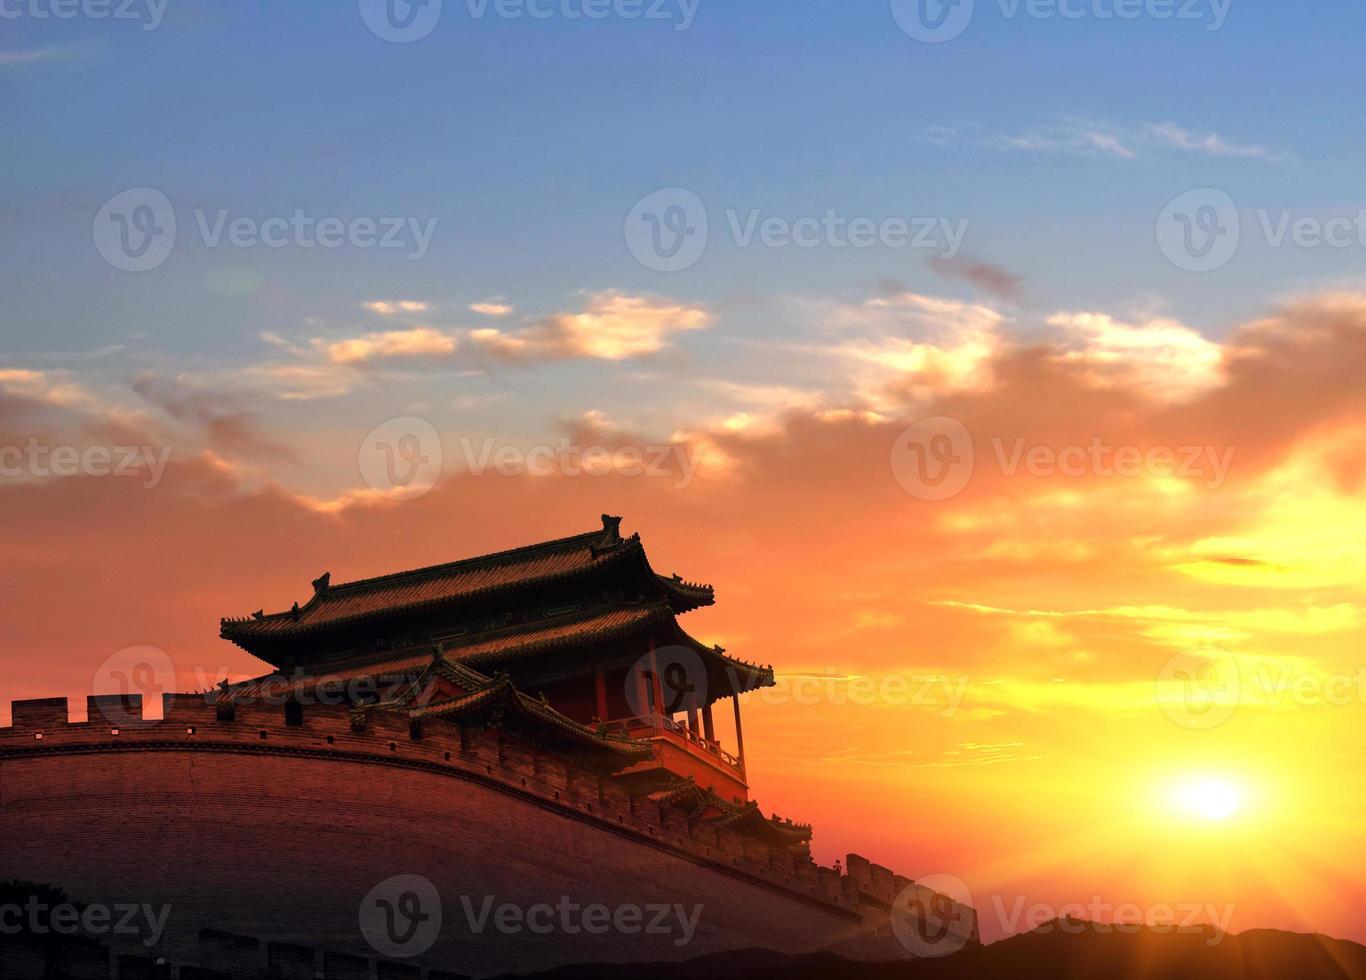 arquitetura antiga chinesa de Pequim, locais religiosos antigos foto